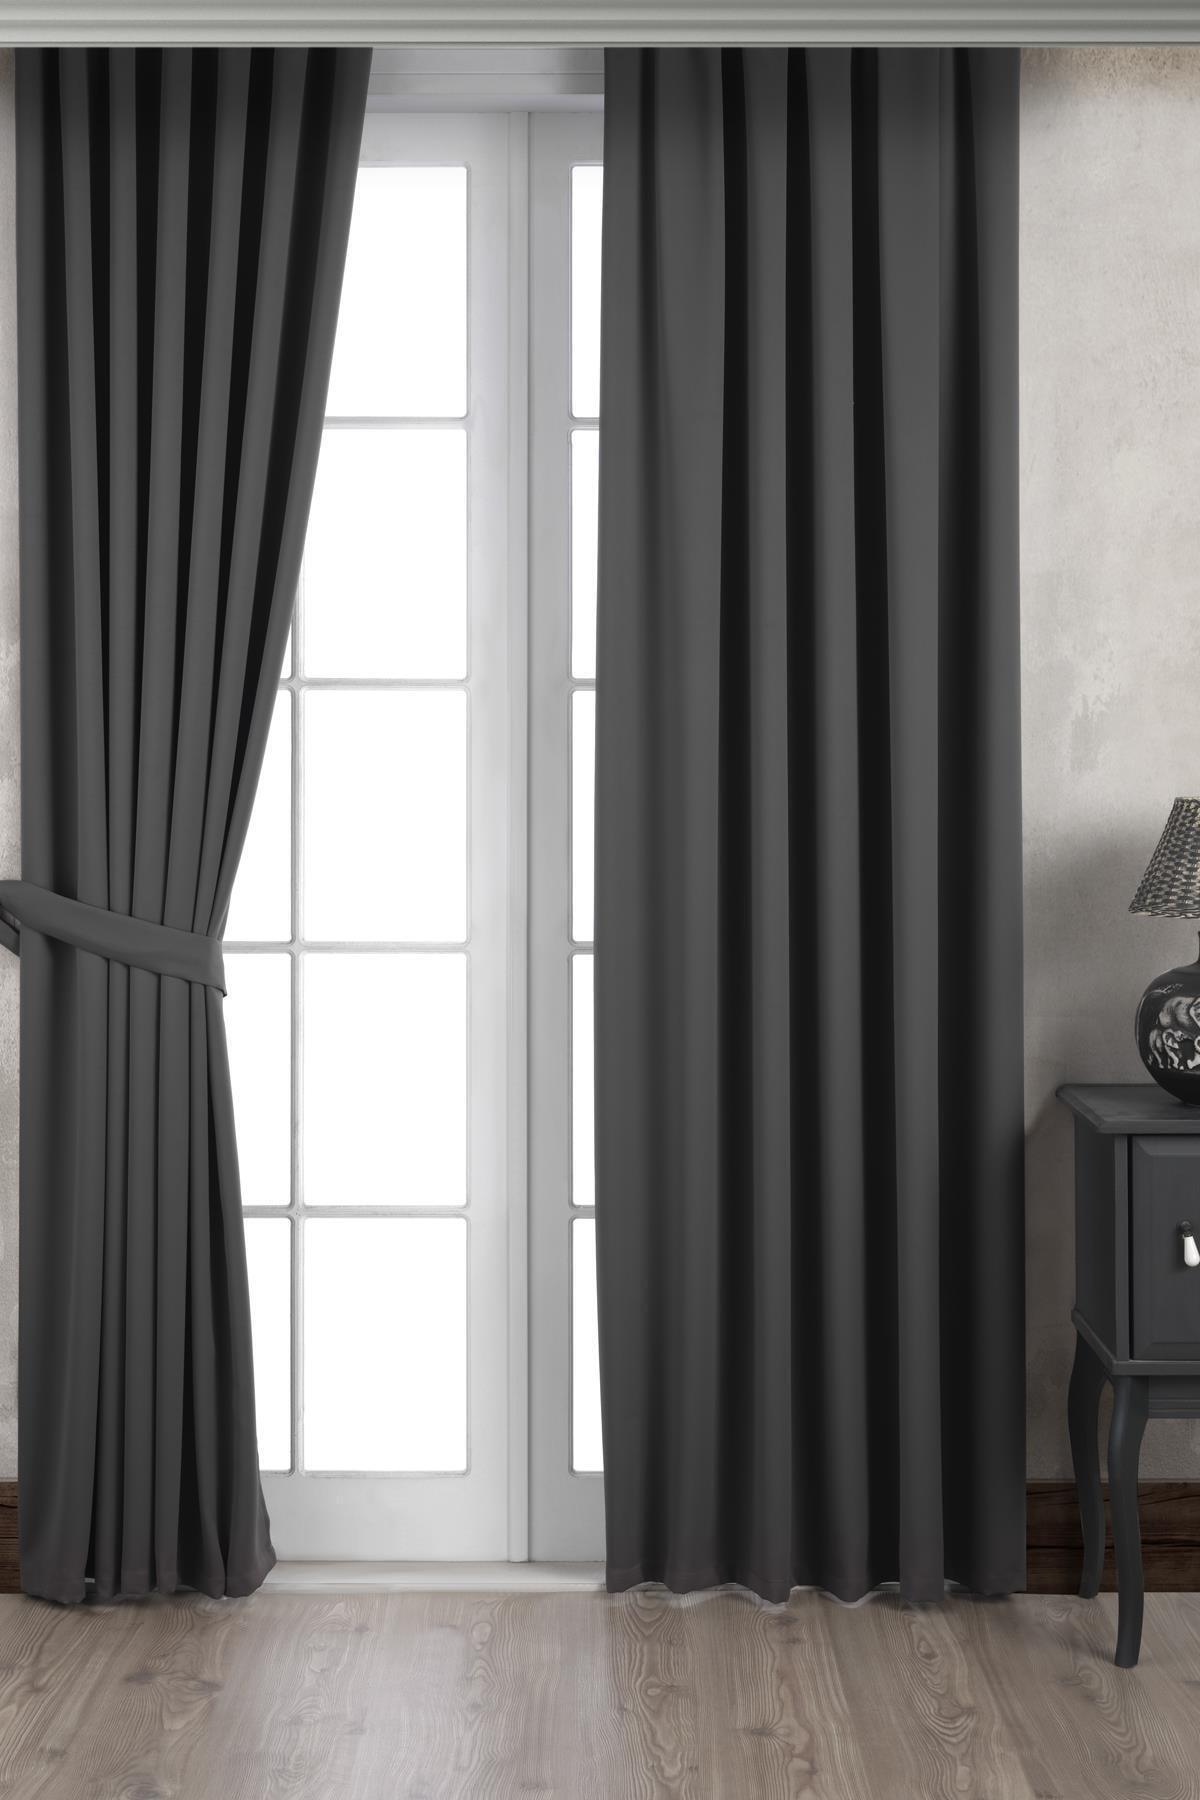 Blackout Fon Perde 150x250 cm